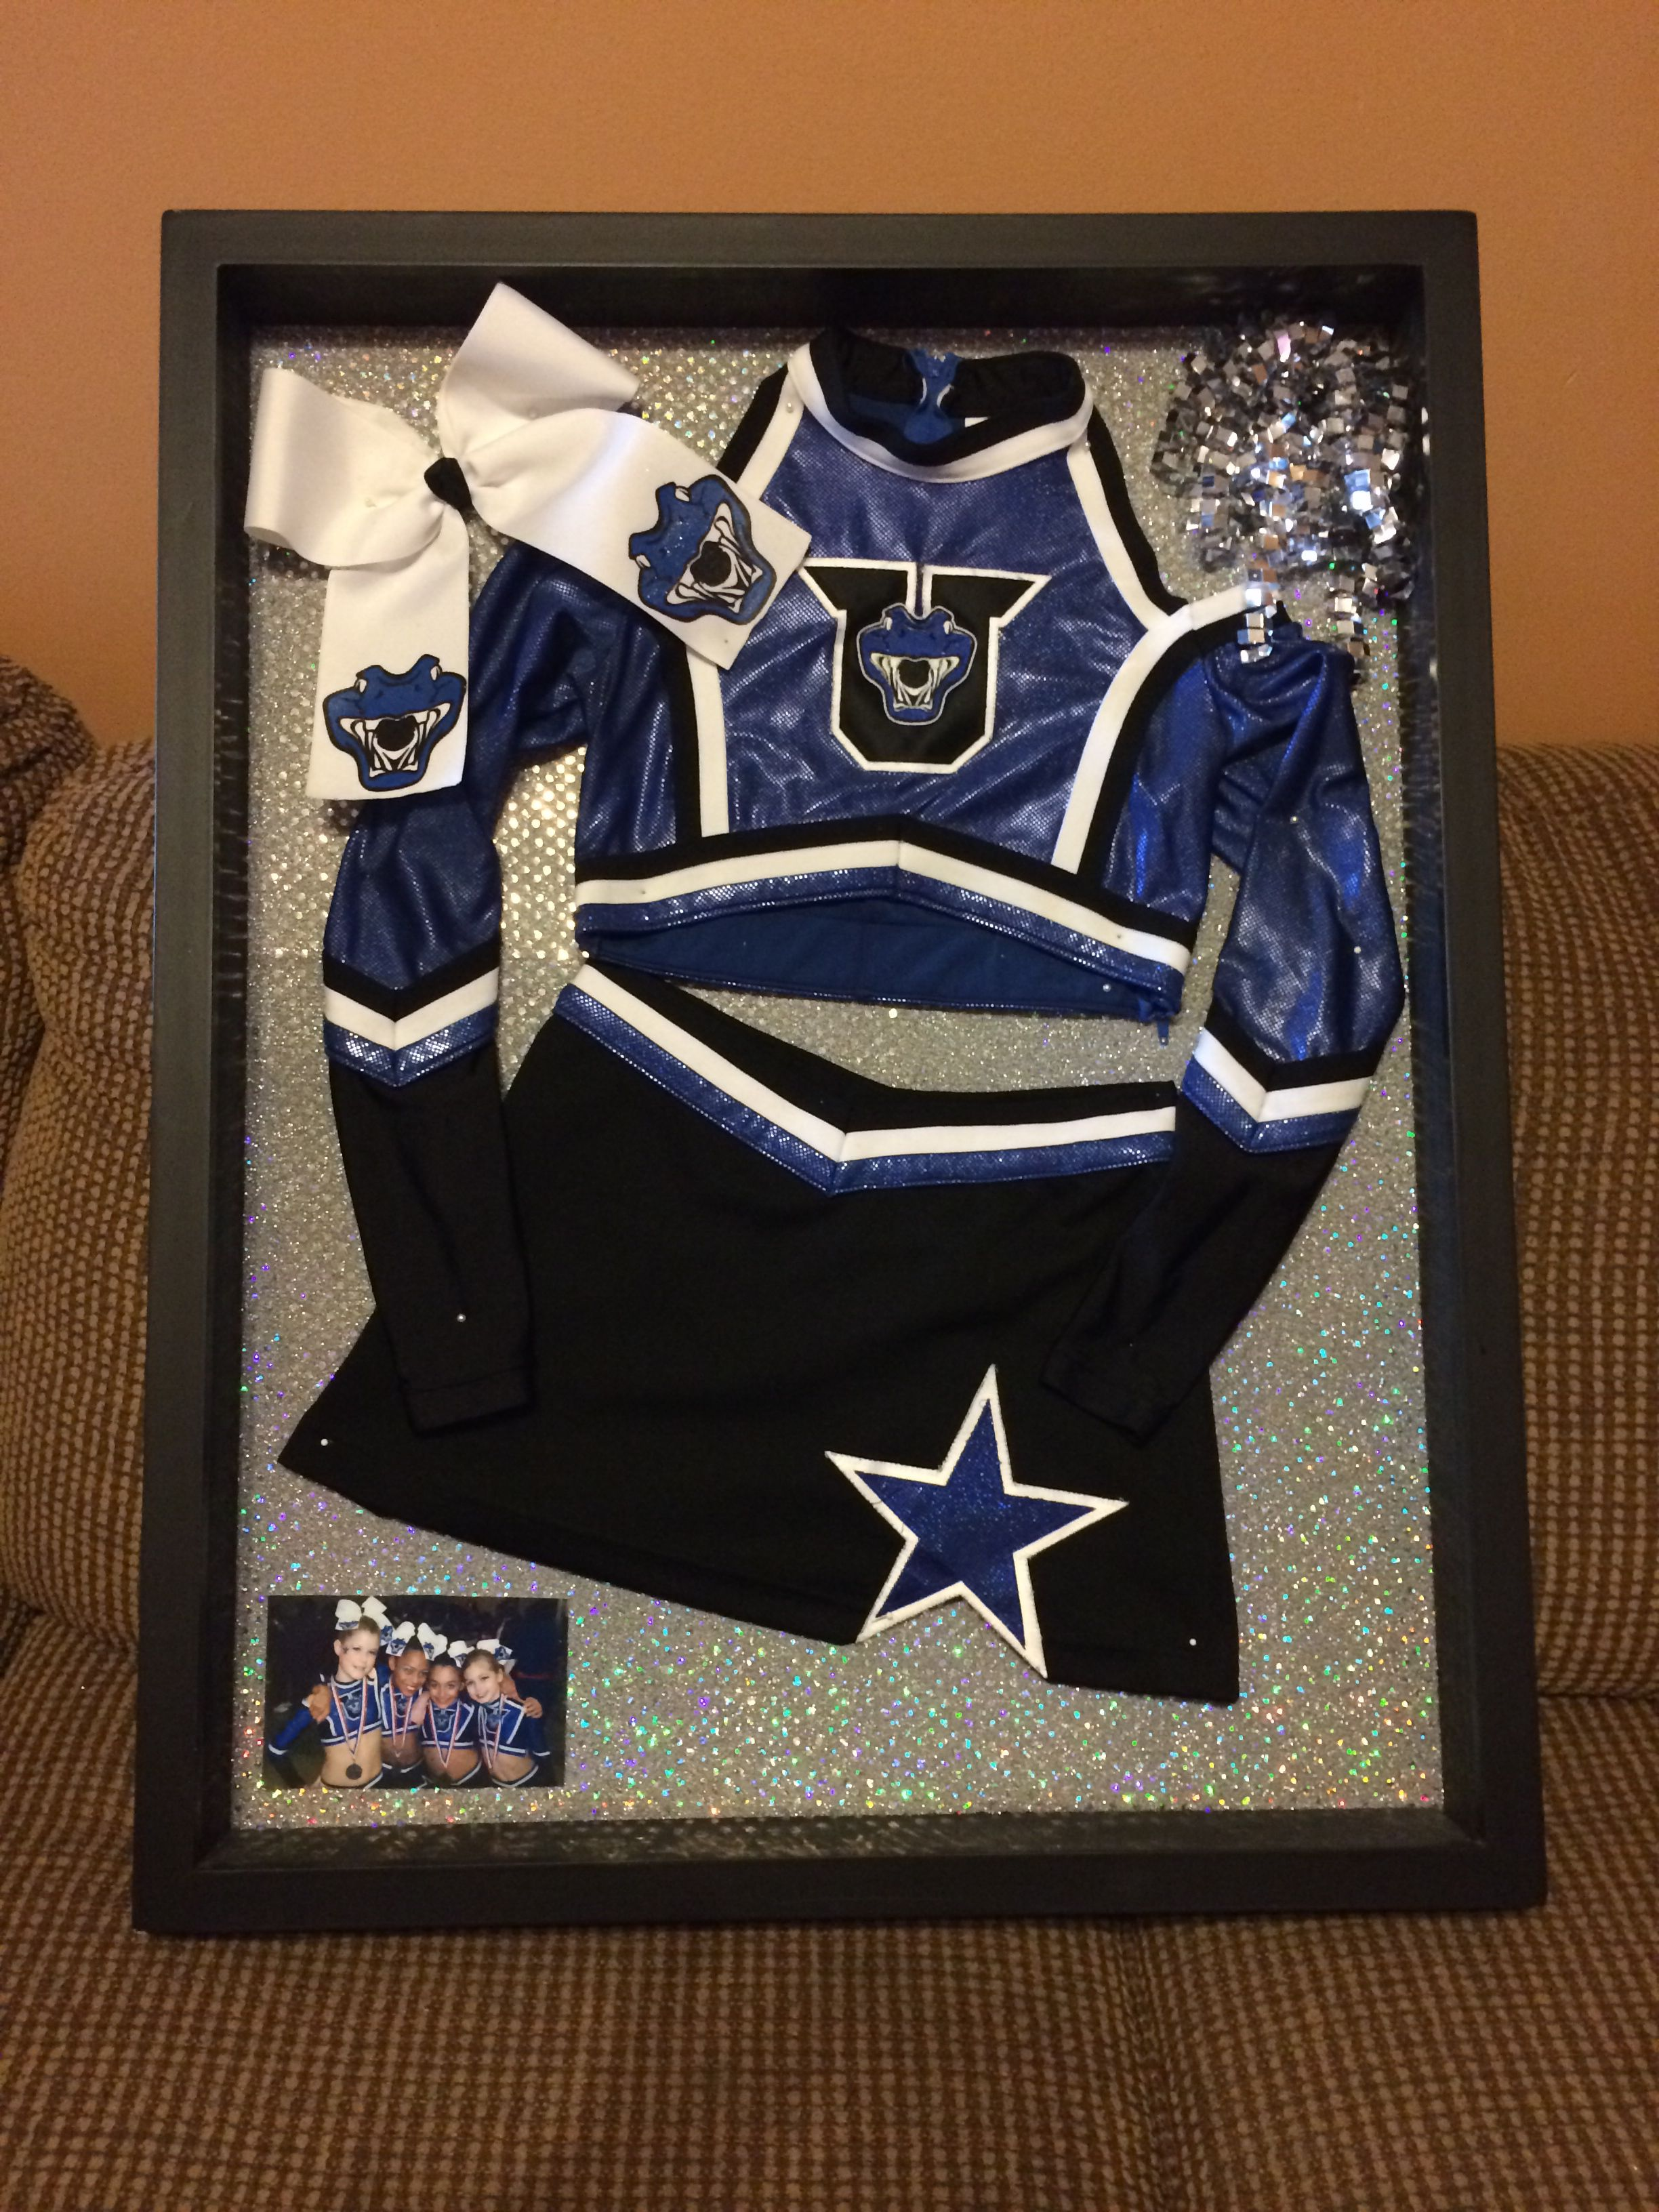 Shadow box cheer uniform | Cheer Gifts For Team | Pinterest